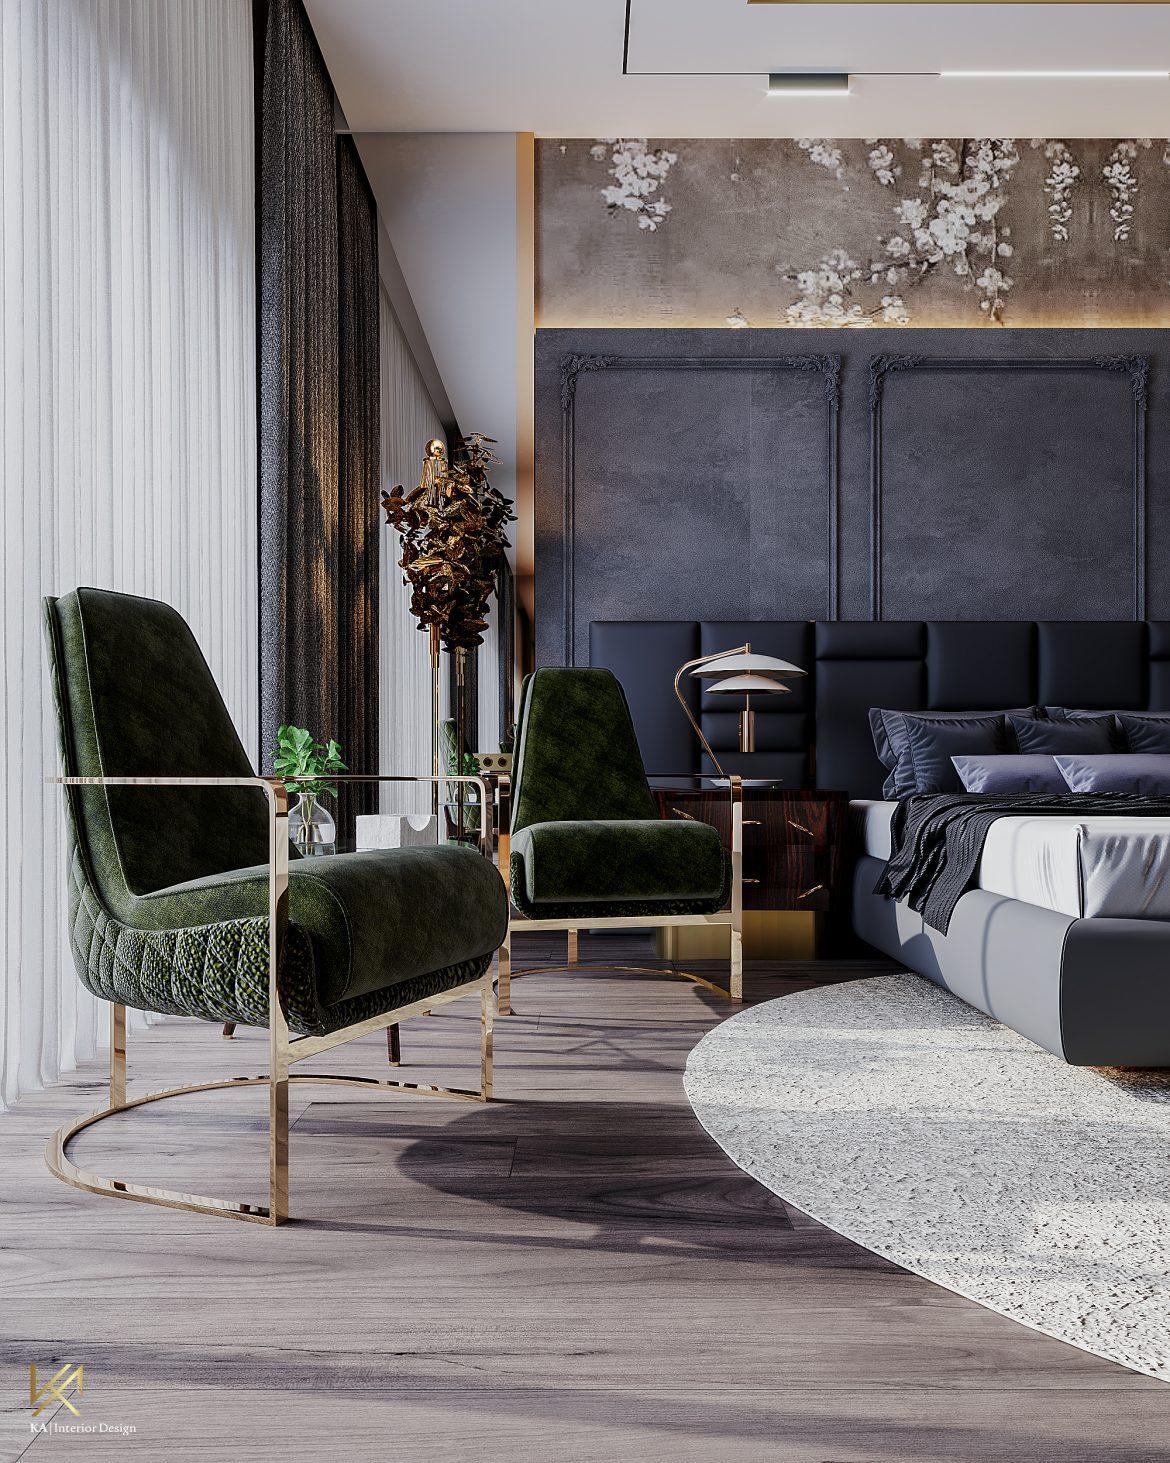 Covet House x K.A Interior Design:  A Opulent Modern Classic Villa In Riyadh Guest Bedroom 2